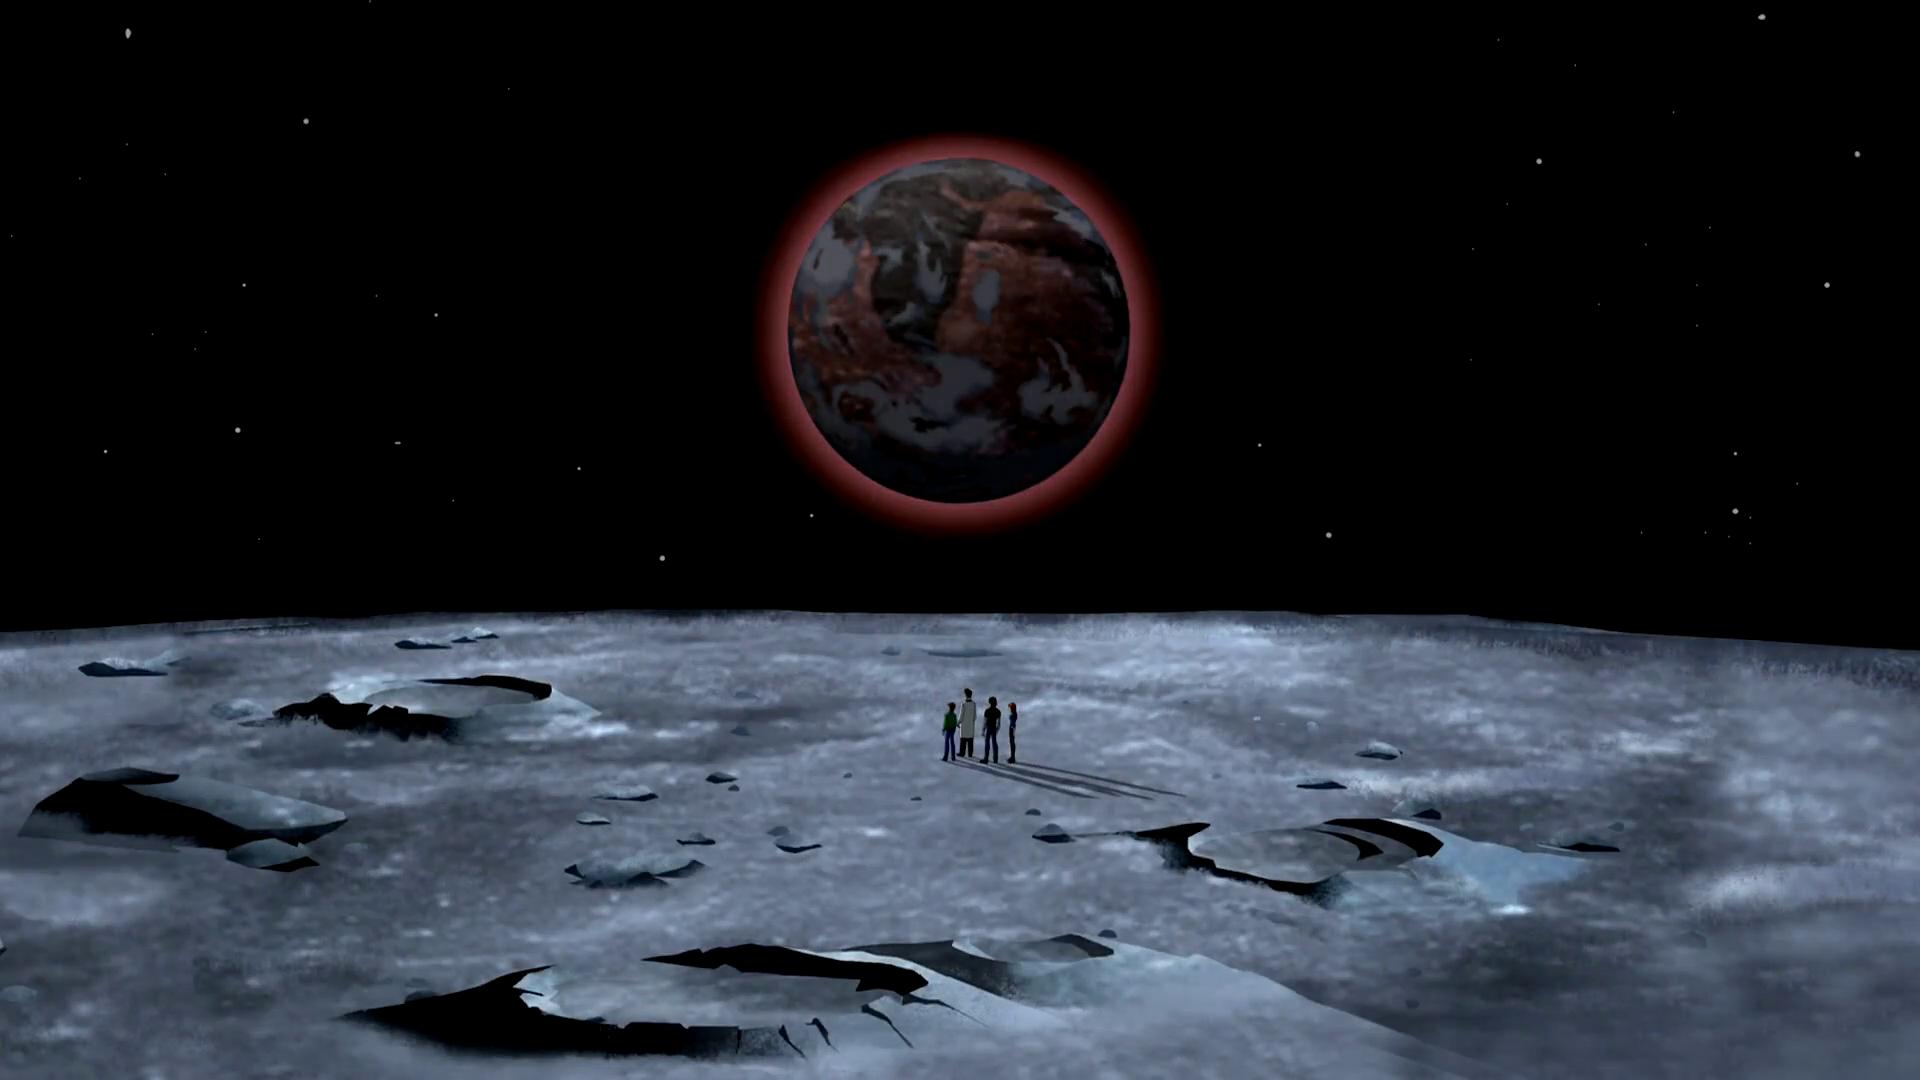 the moon paradox